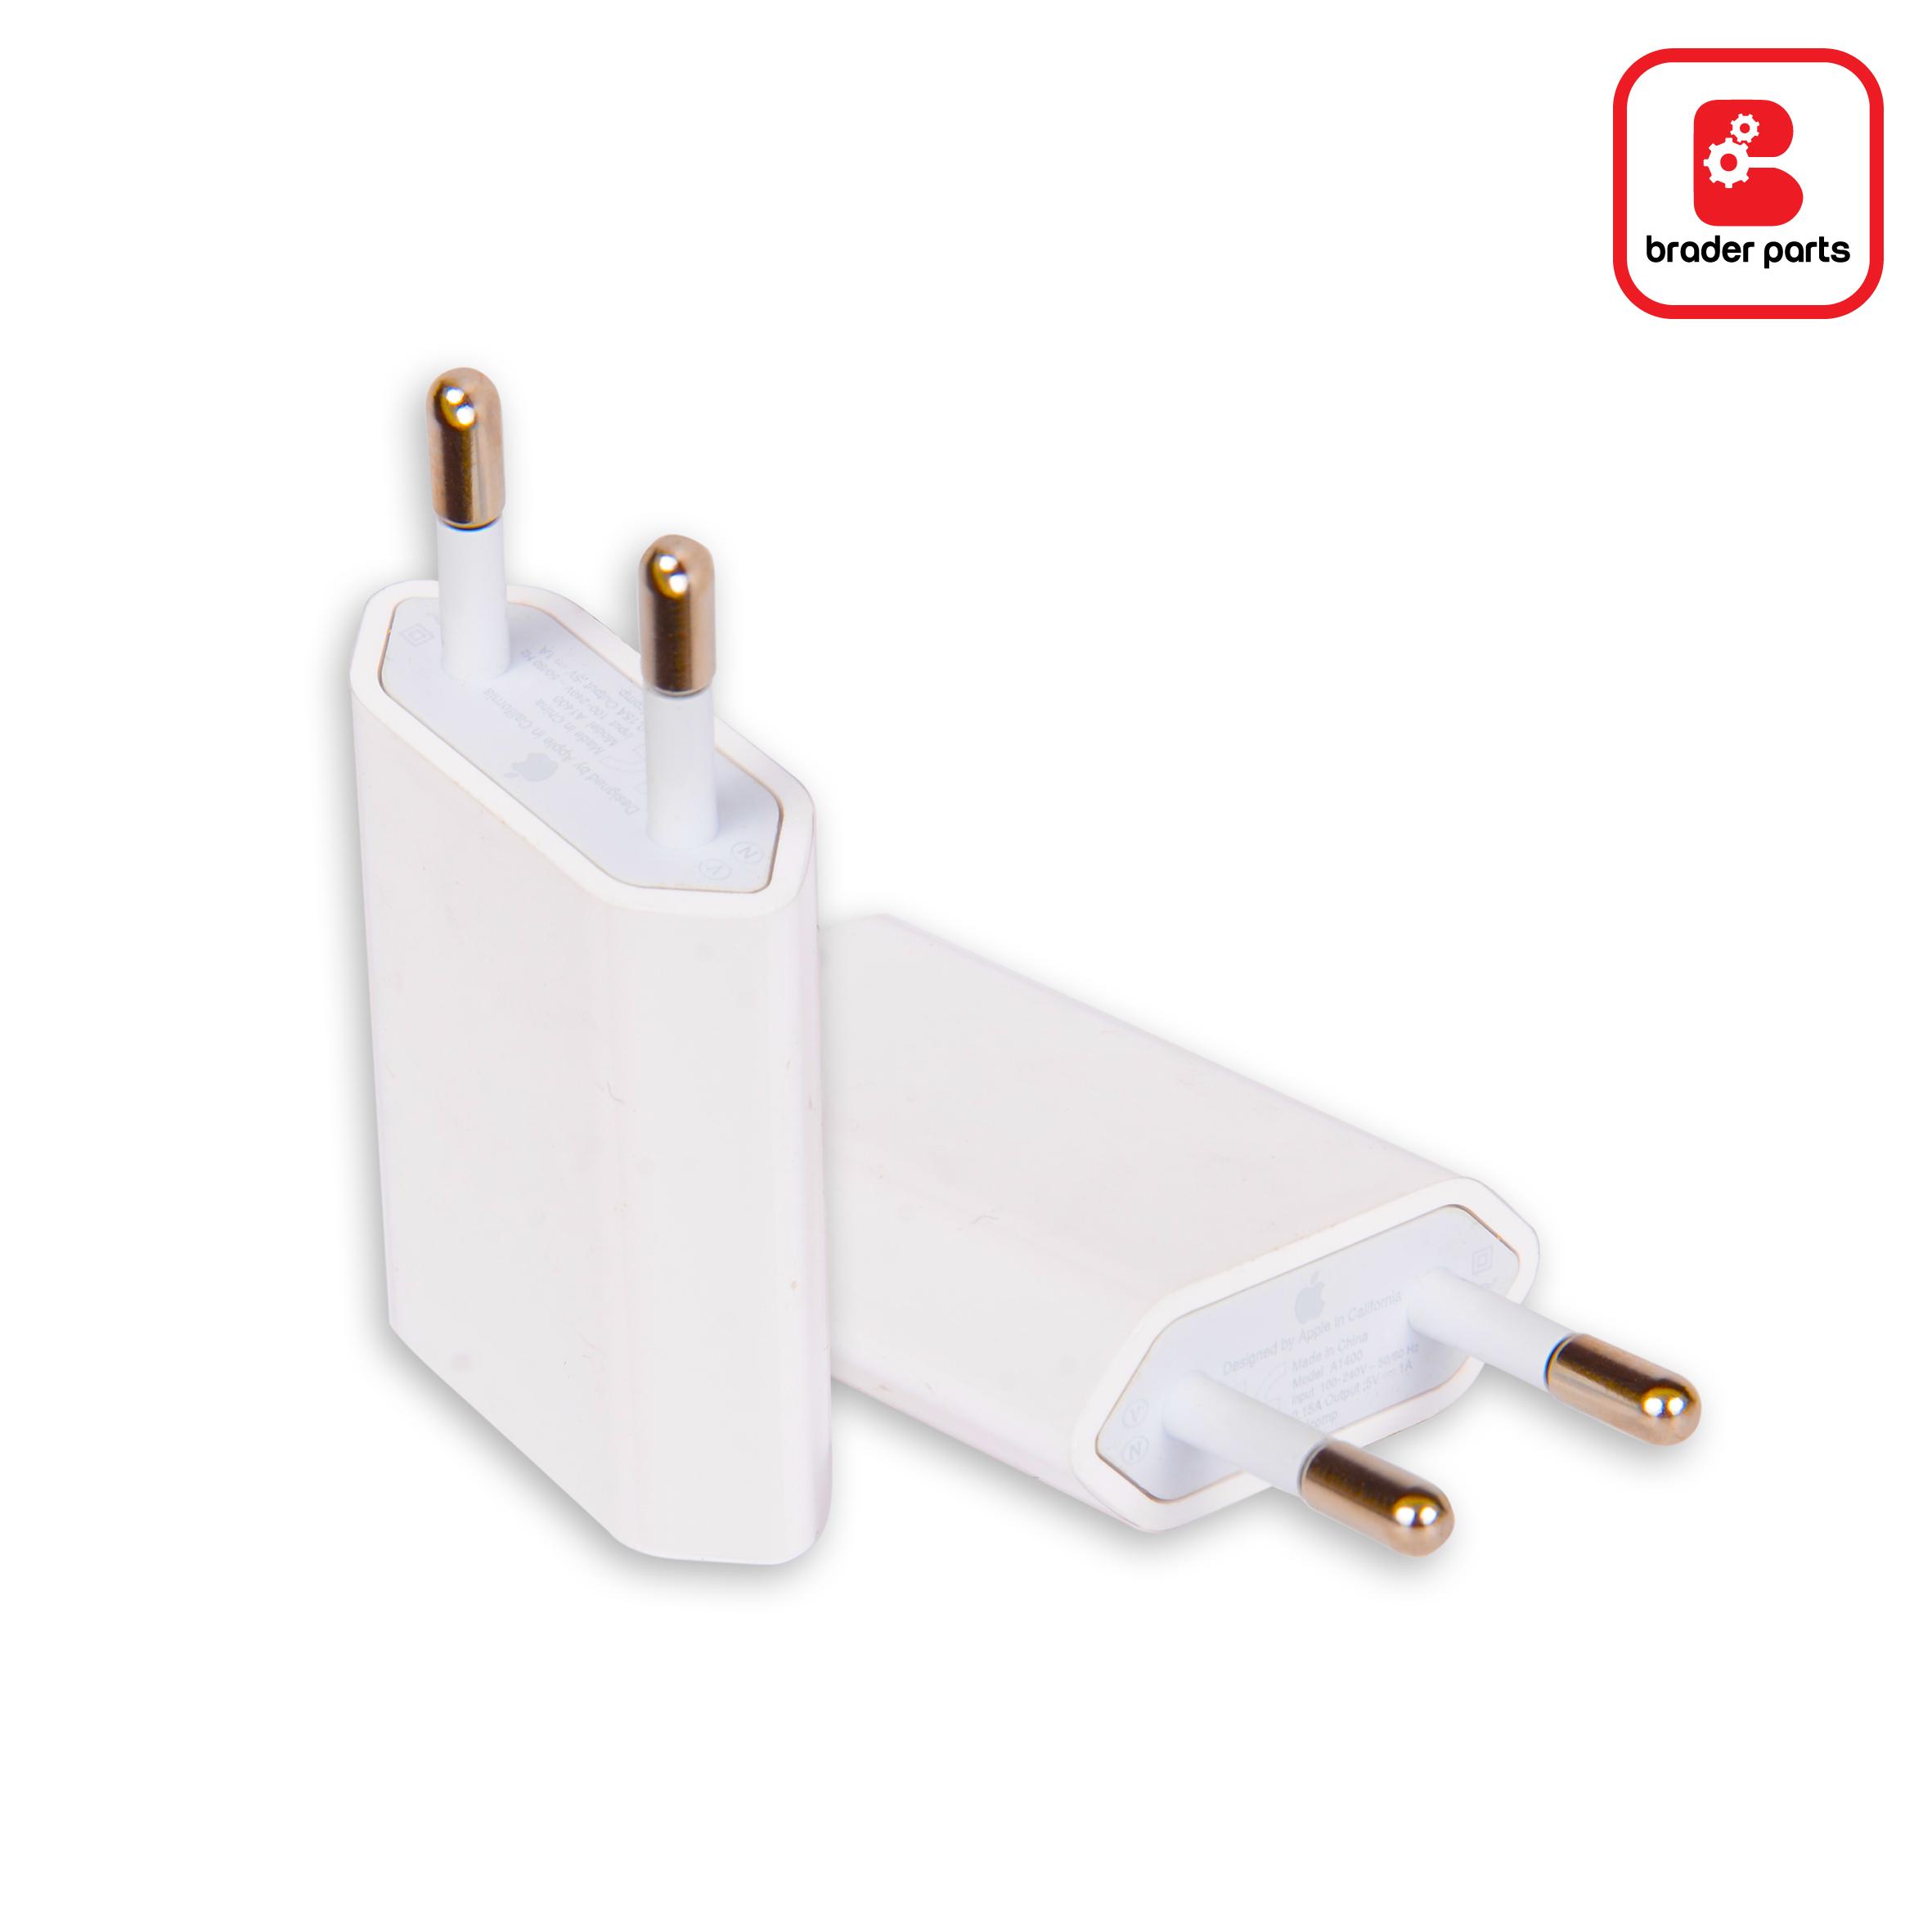 Kabel Charger iPhone 5 Grade A+